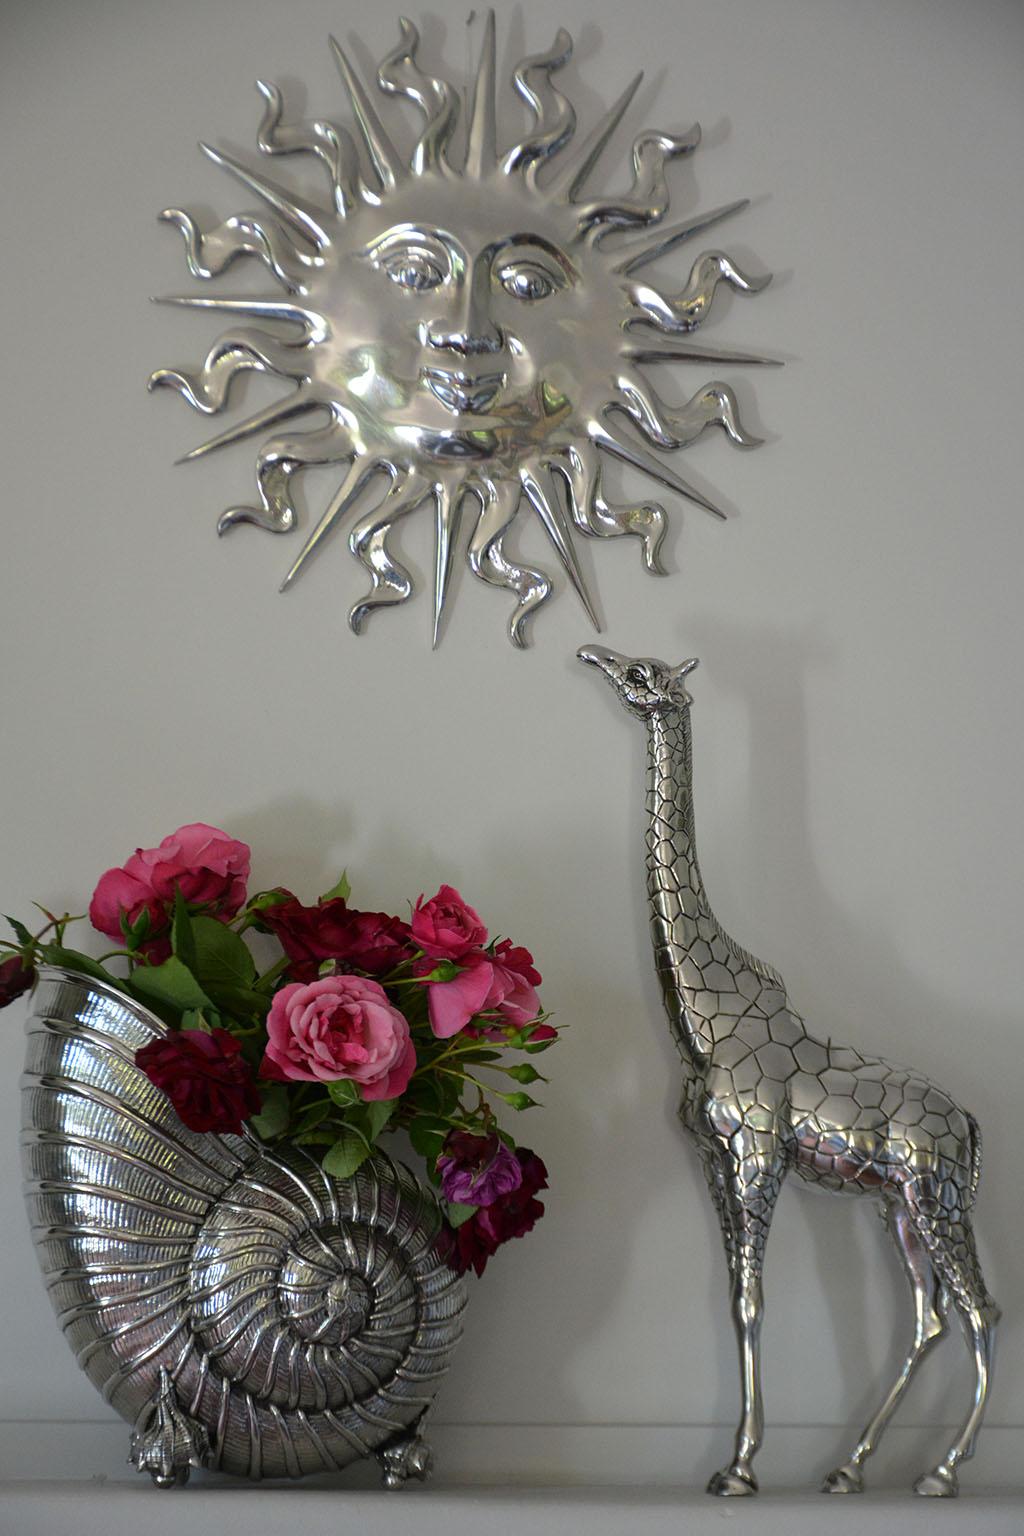 cadeau objets étain girafe soleil vase seau champagne coquille